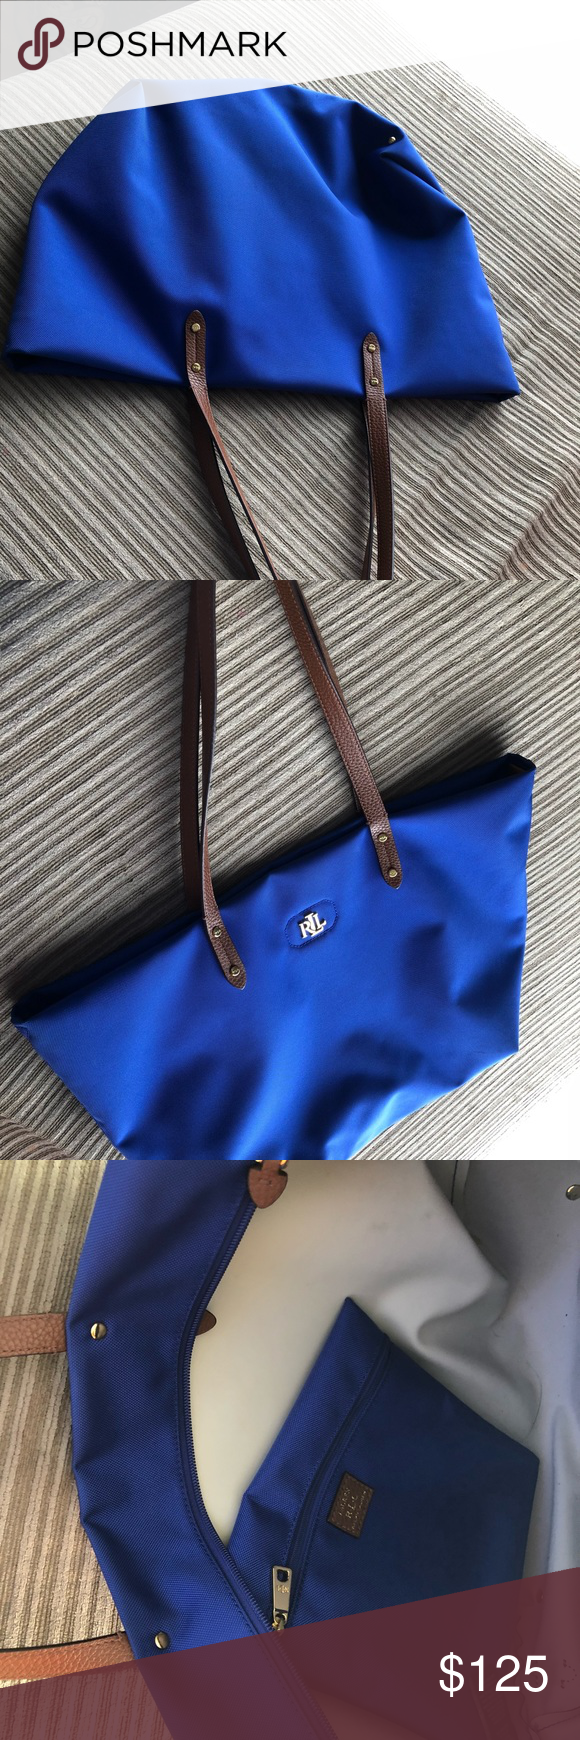 912606045e 🚨Sale🚨RLL Tote Bag Royal Blue color Beautiful Tote RLL Ralph Lauren Bags  Totes